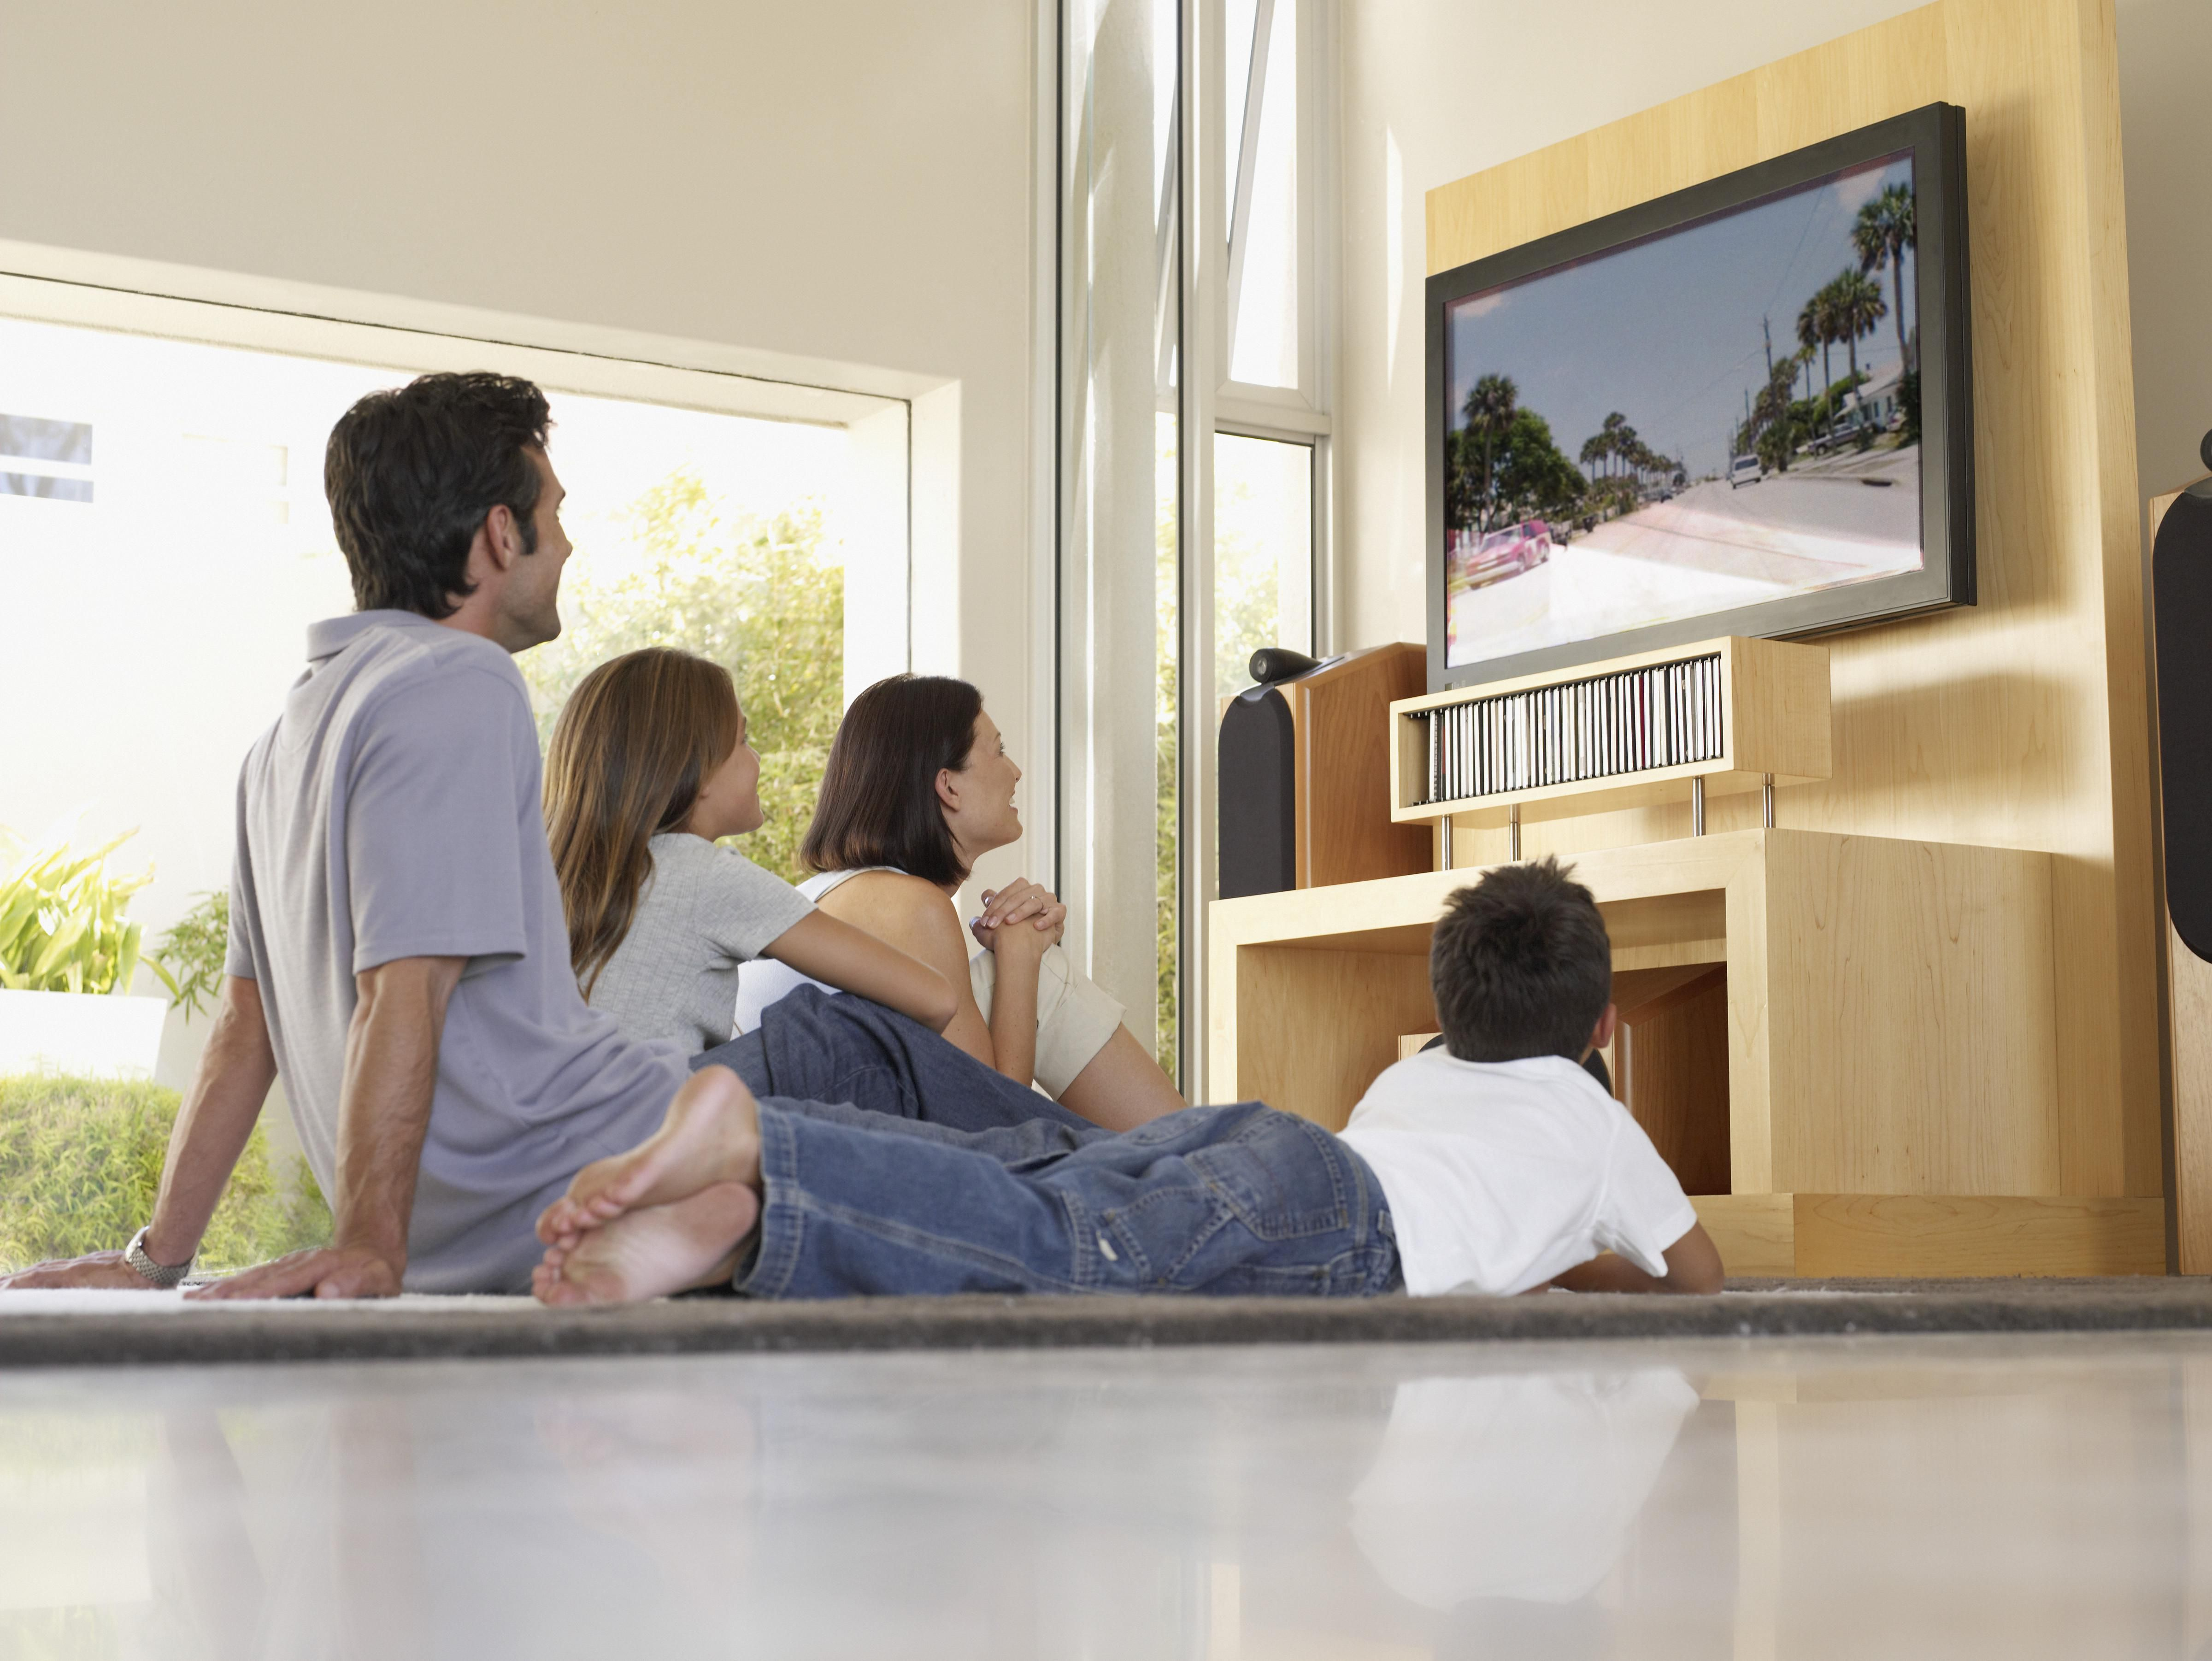 Meet A Real Nielsen Ratings Family